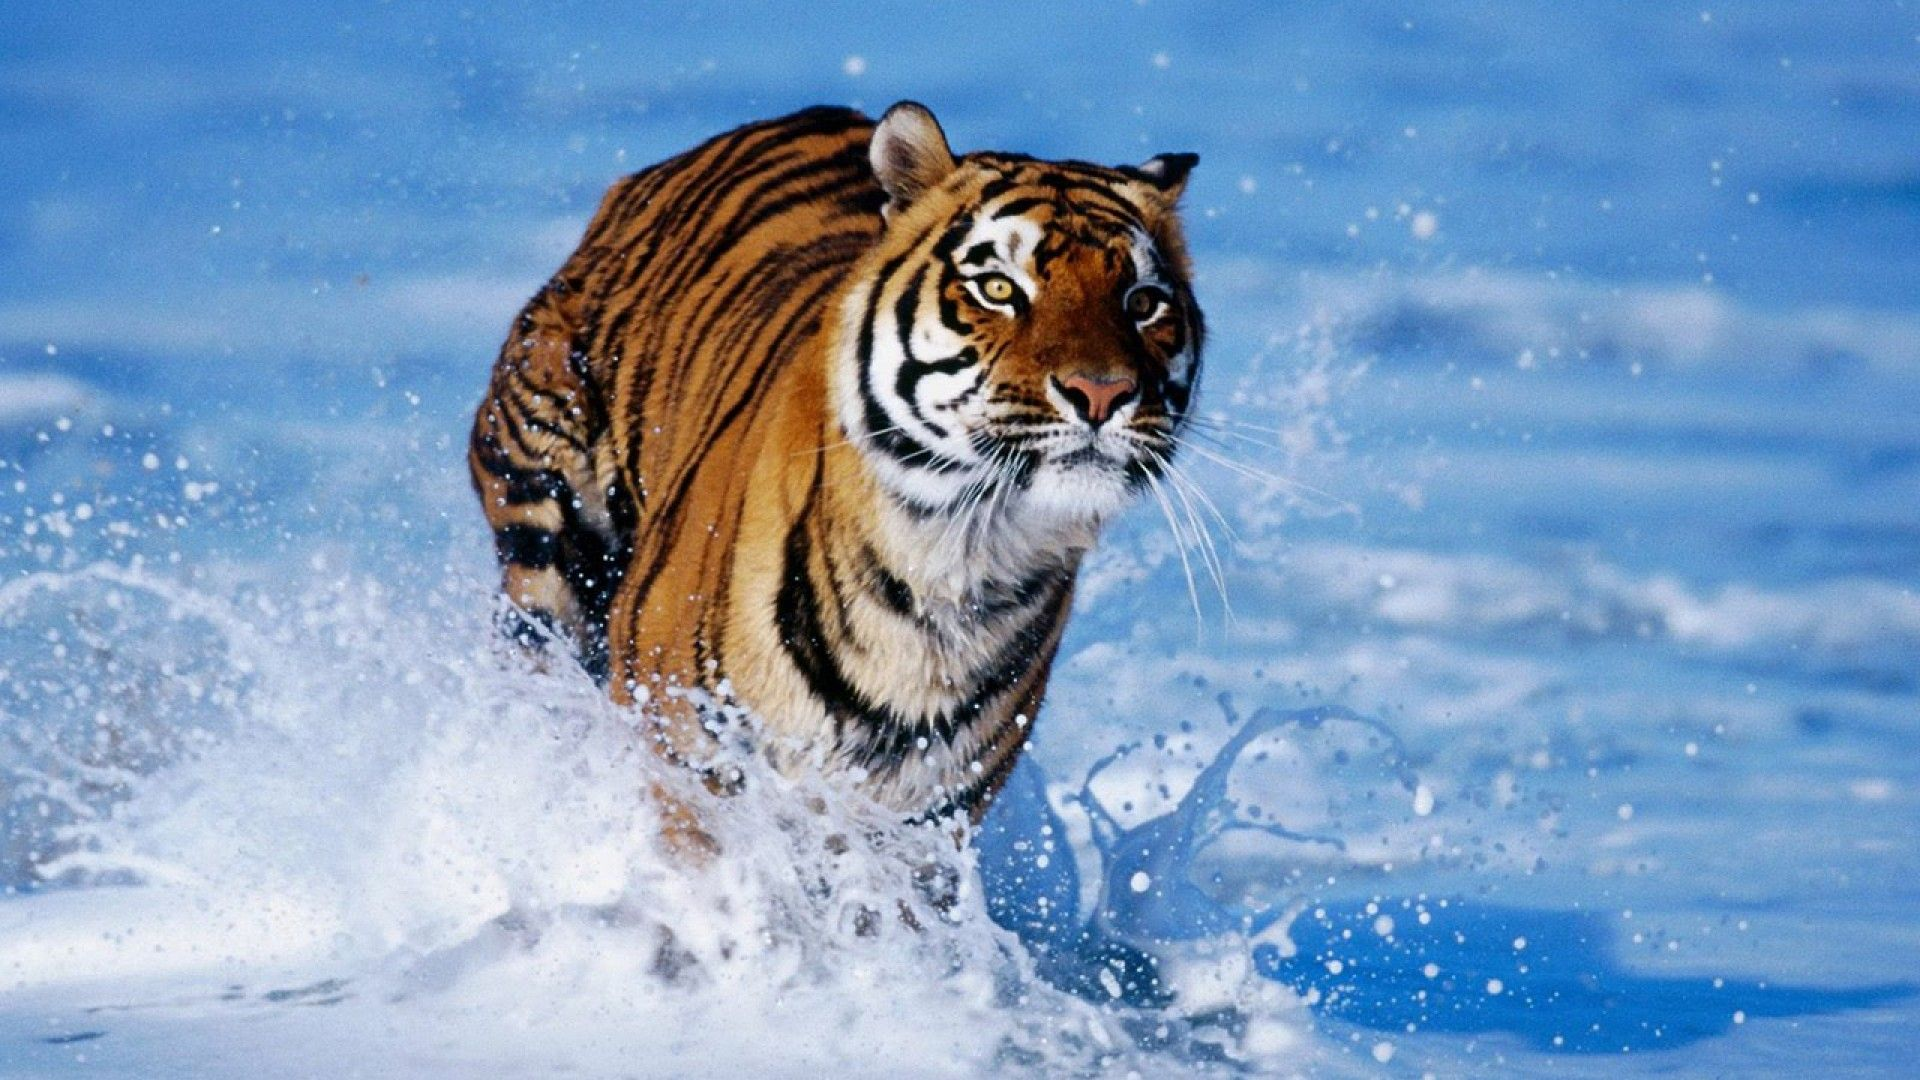 tiger image download